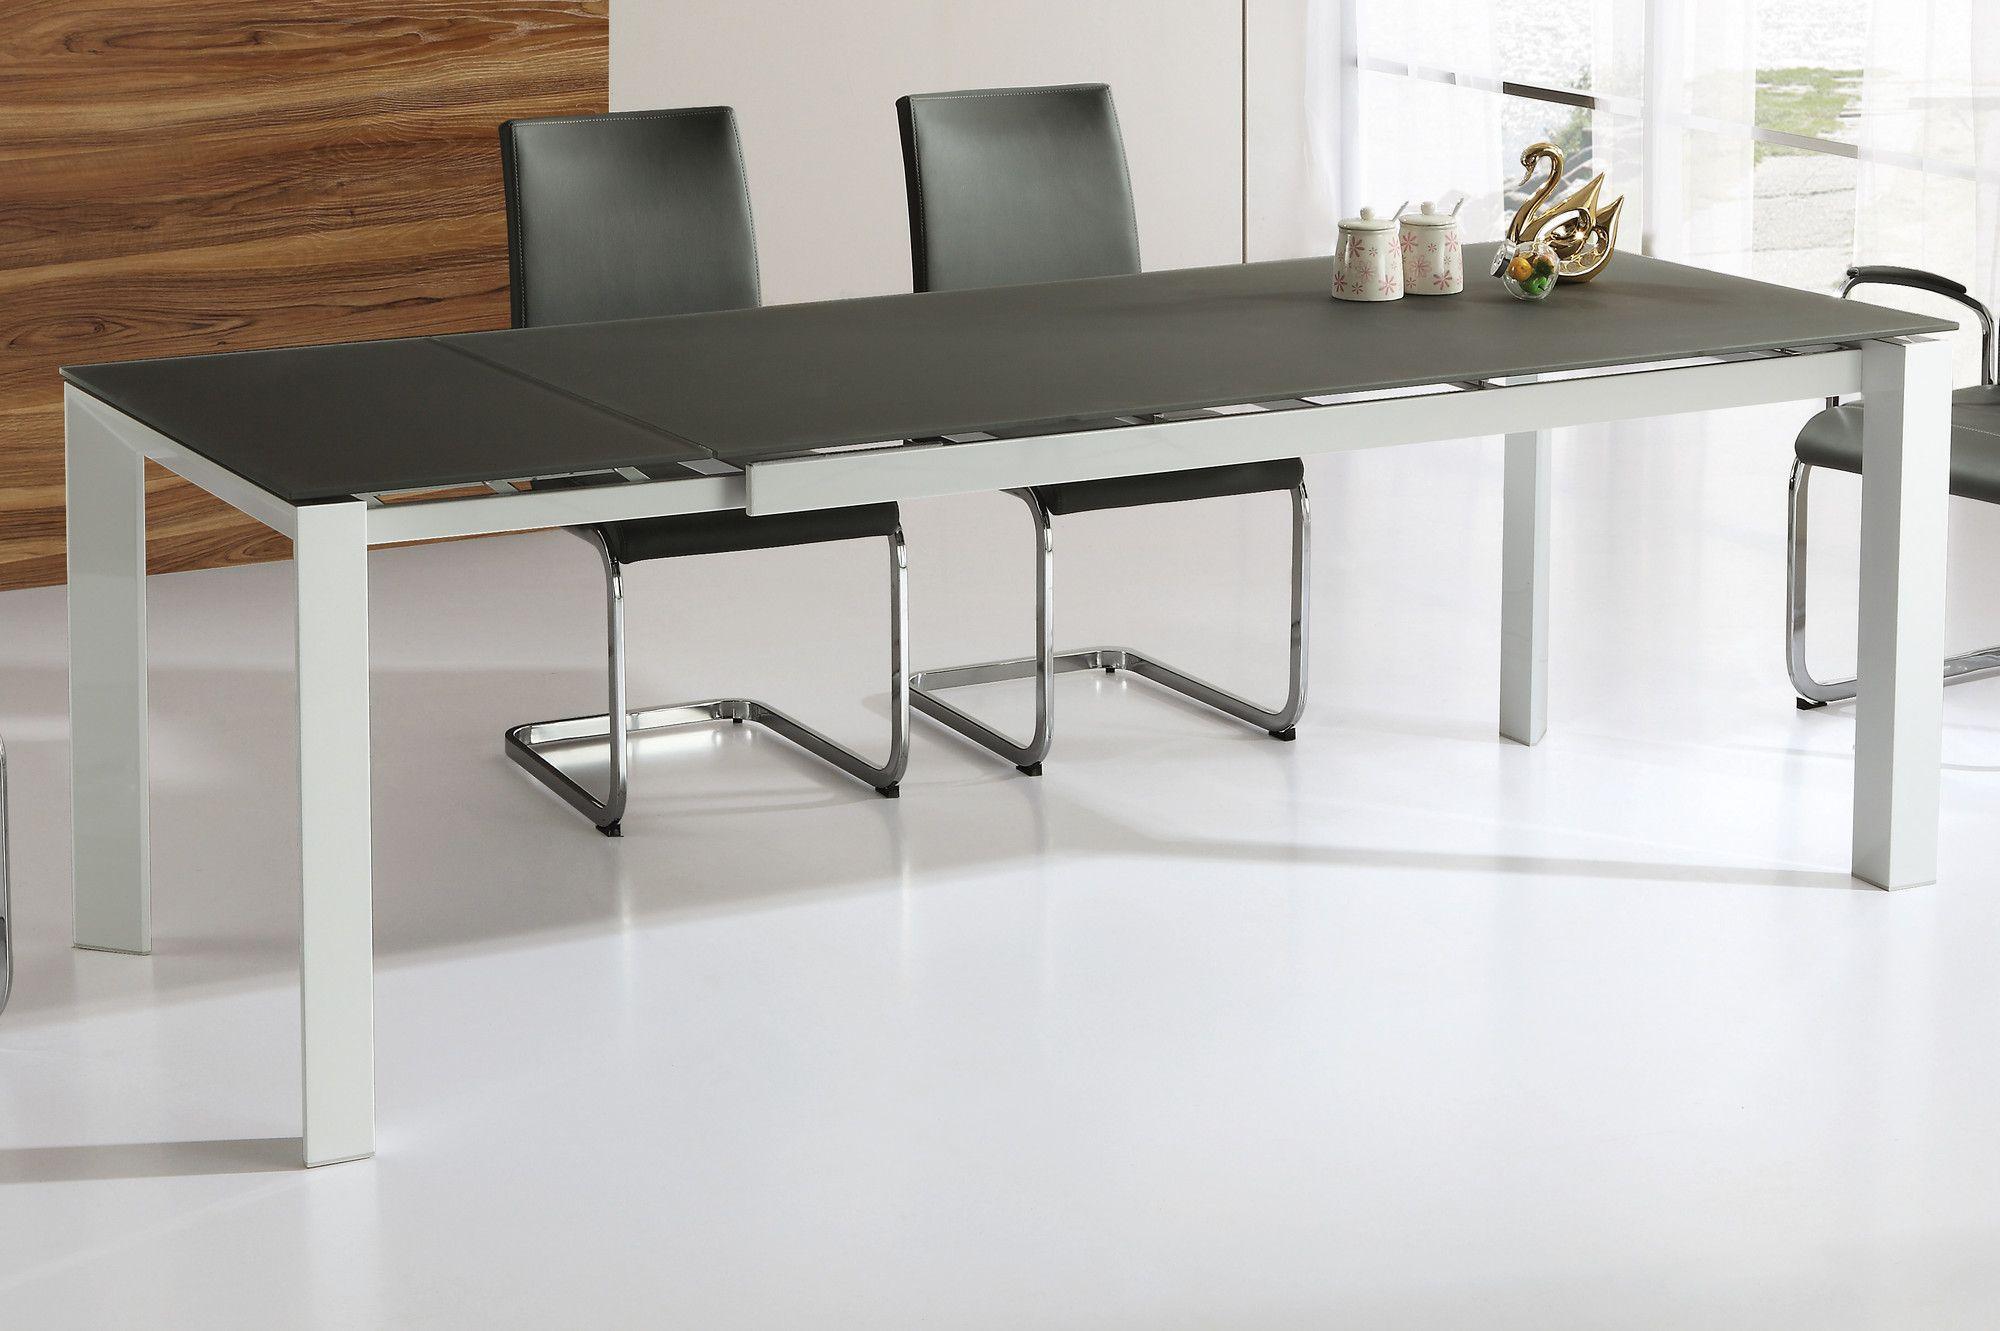 Extending Table 187 Black Extending Tables : 436 5932PI1000015MNwid2000amphei2000 from extendingtable.co.uk size 2000 x 2000 jpeg 193kB